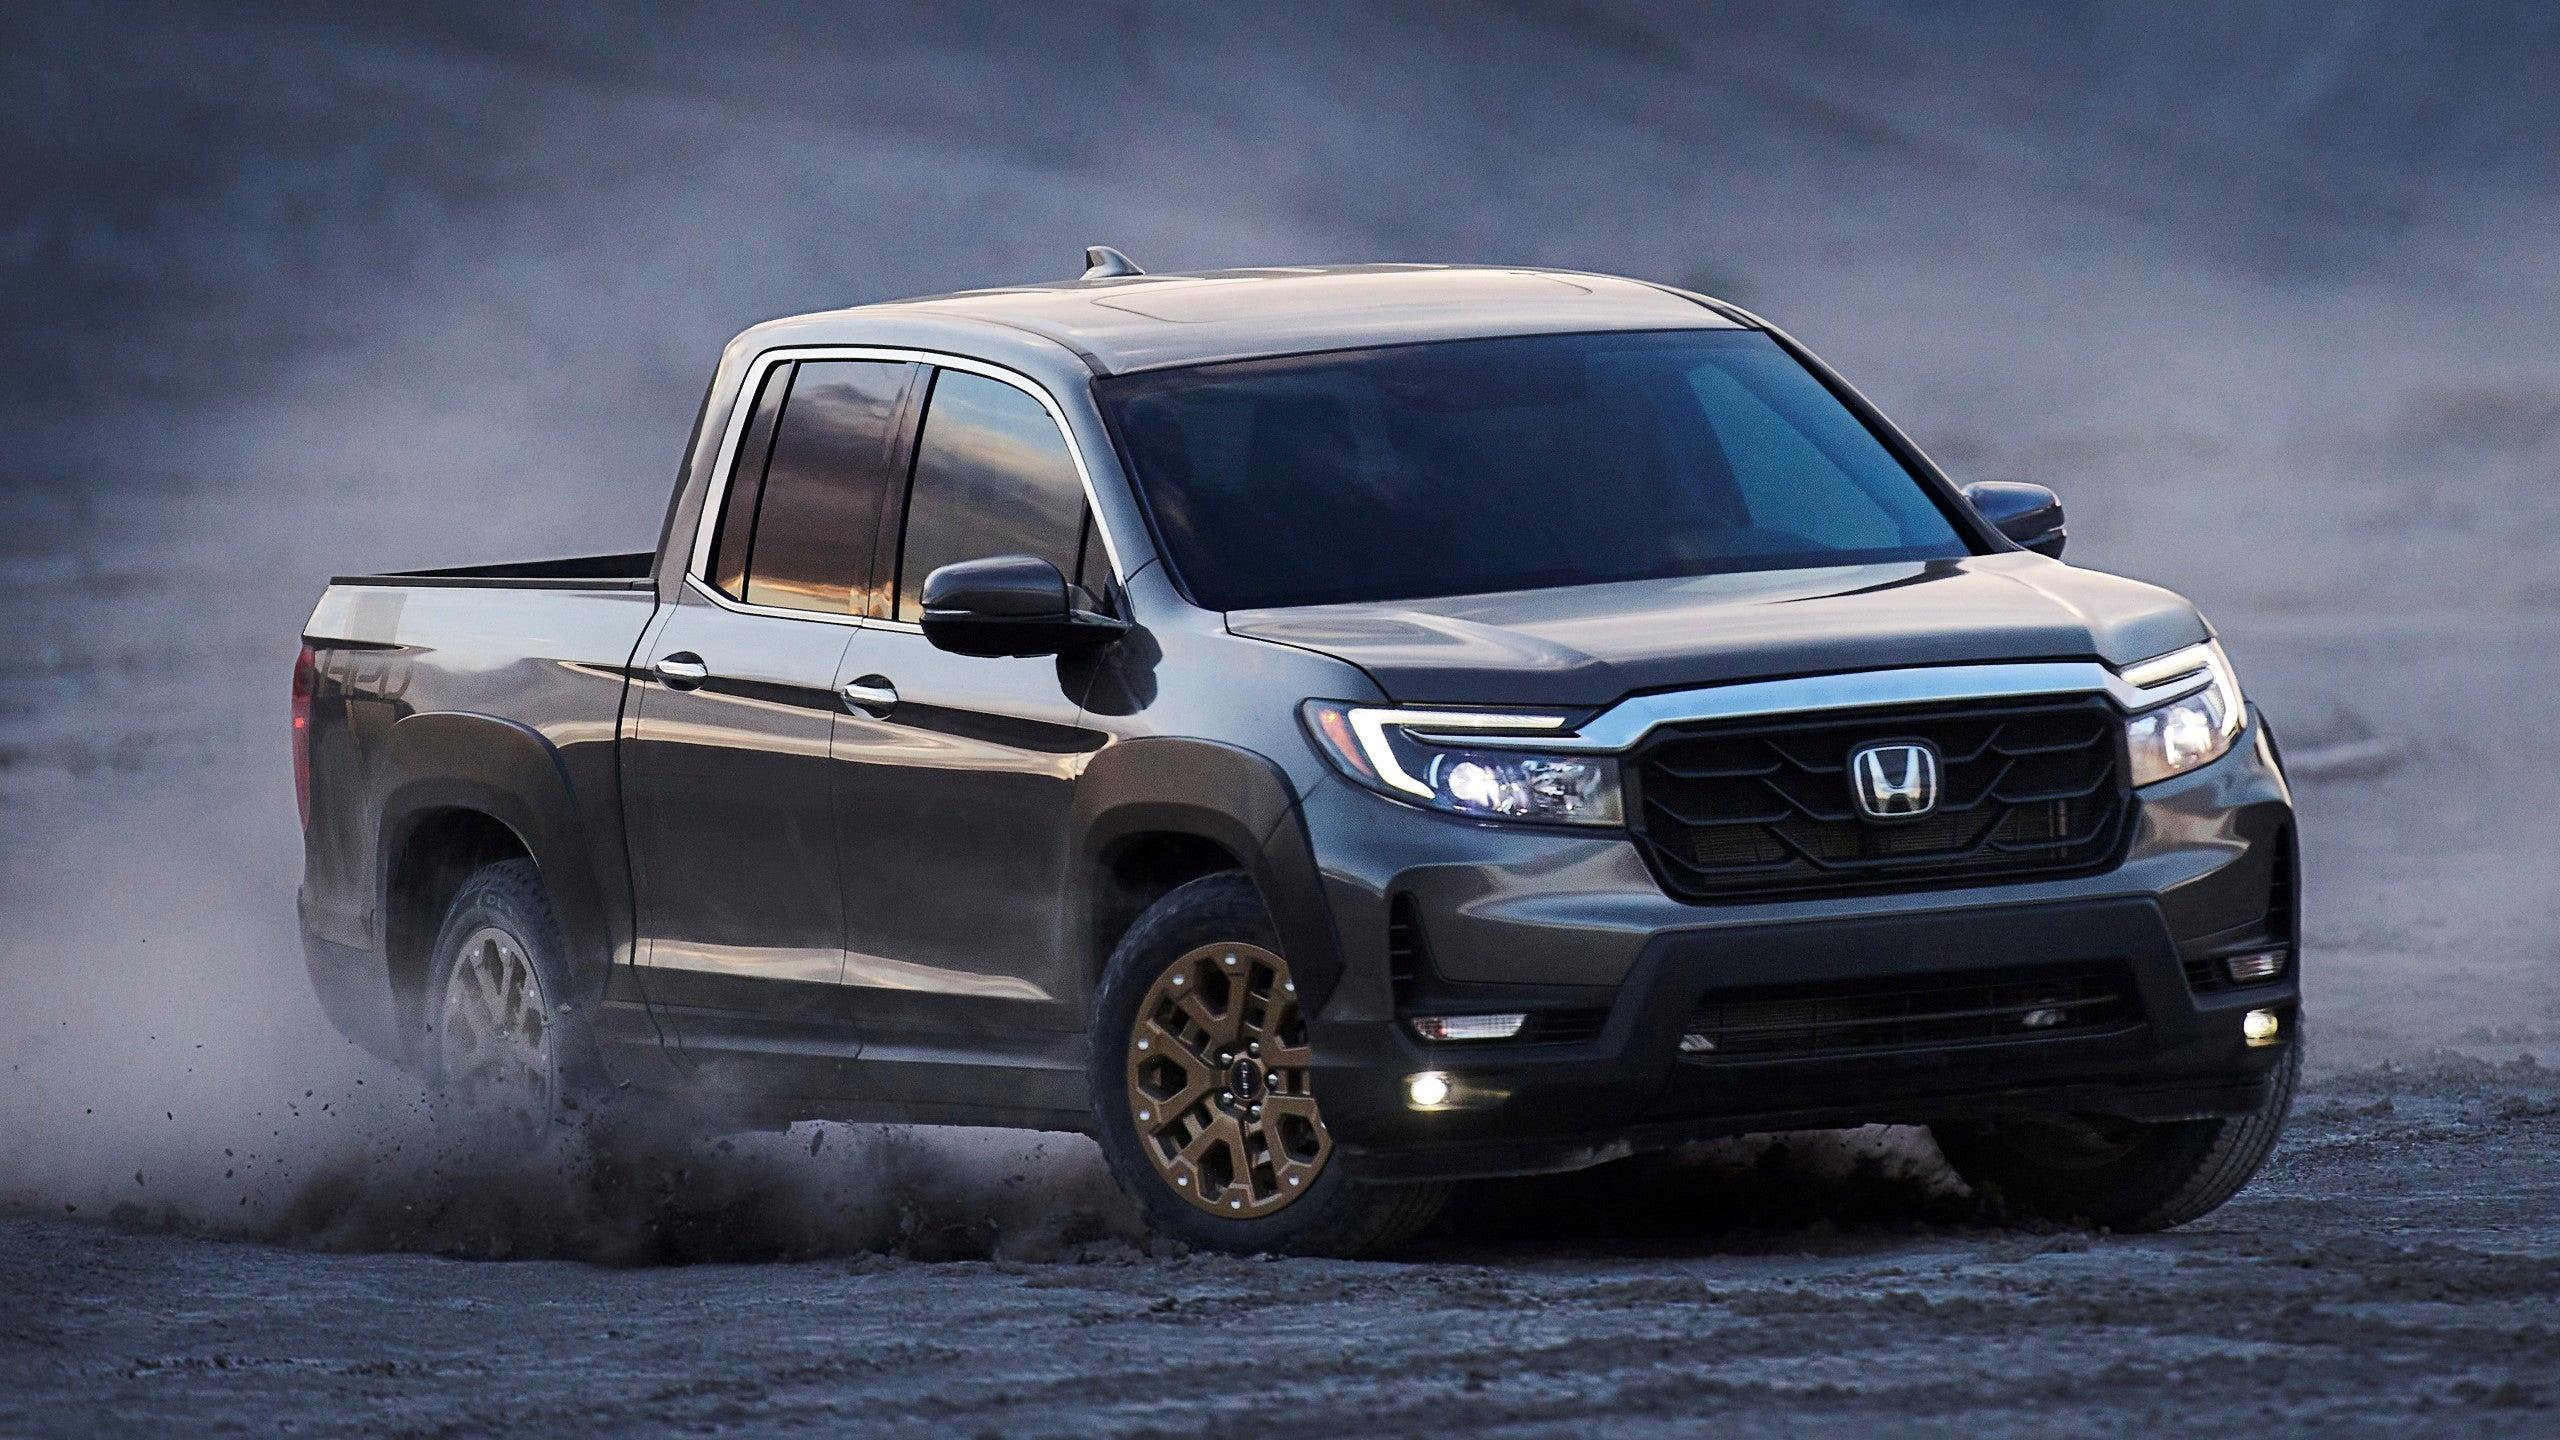 2021 honda ridgeline: more truck than ever, at least